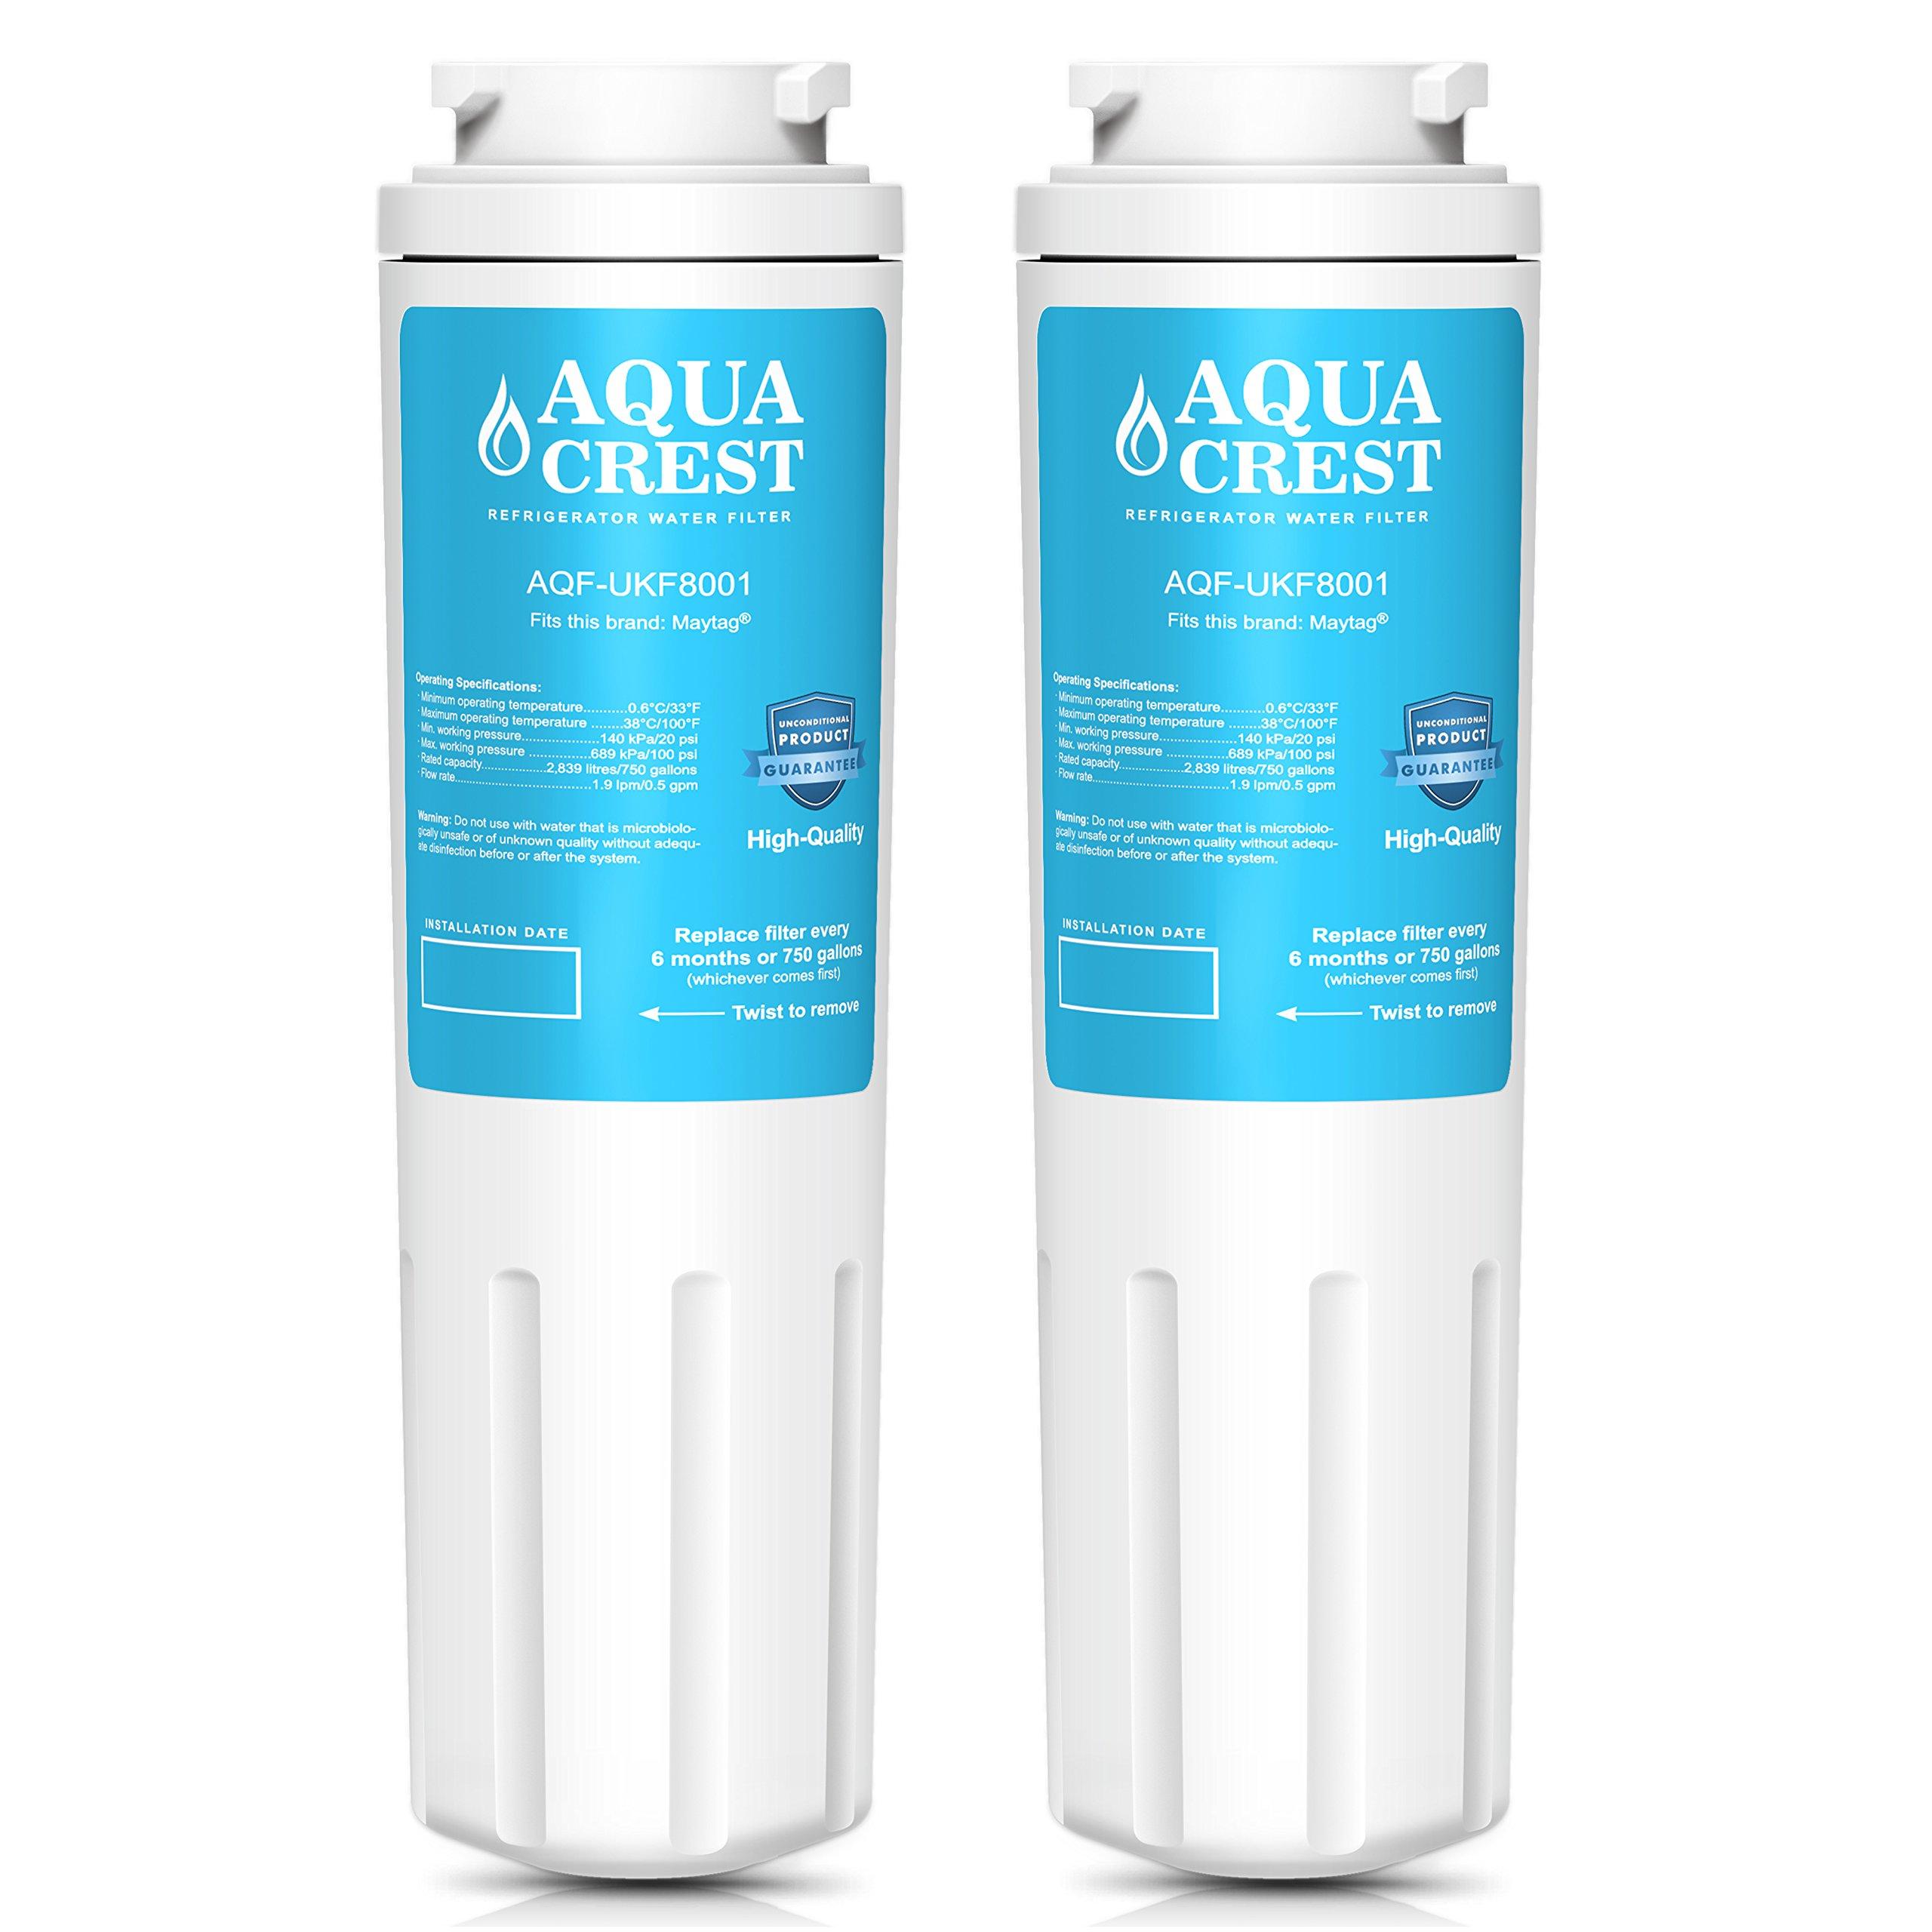 9013af1f94d AquaCrest UKF8001 Refrigerator Water Filter Replacement Maytag UKF8001  UKF8001AXX UKF8001P